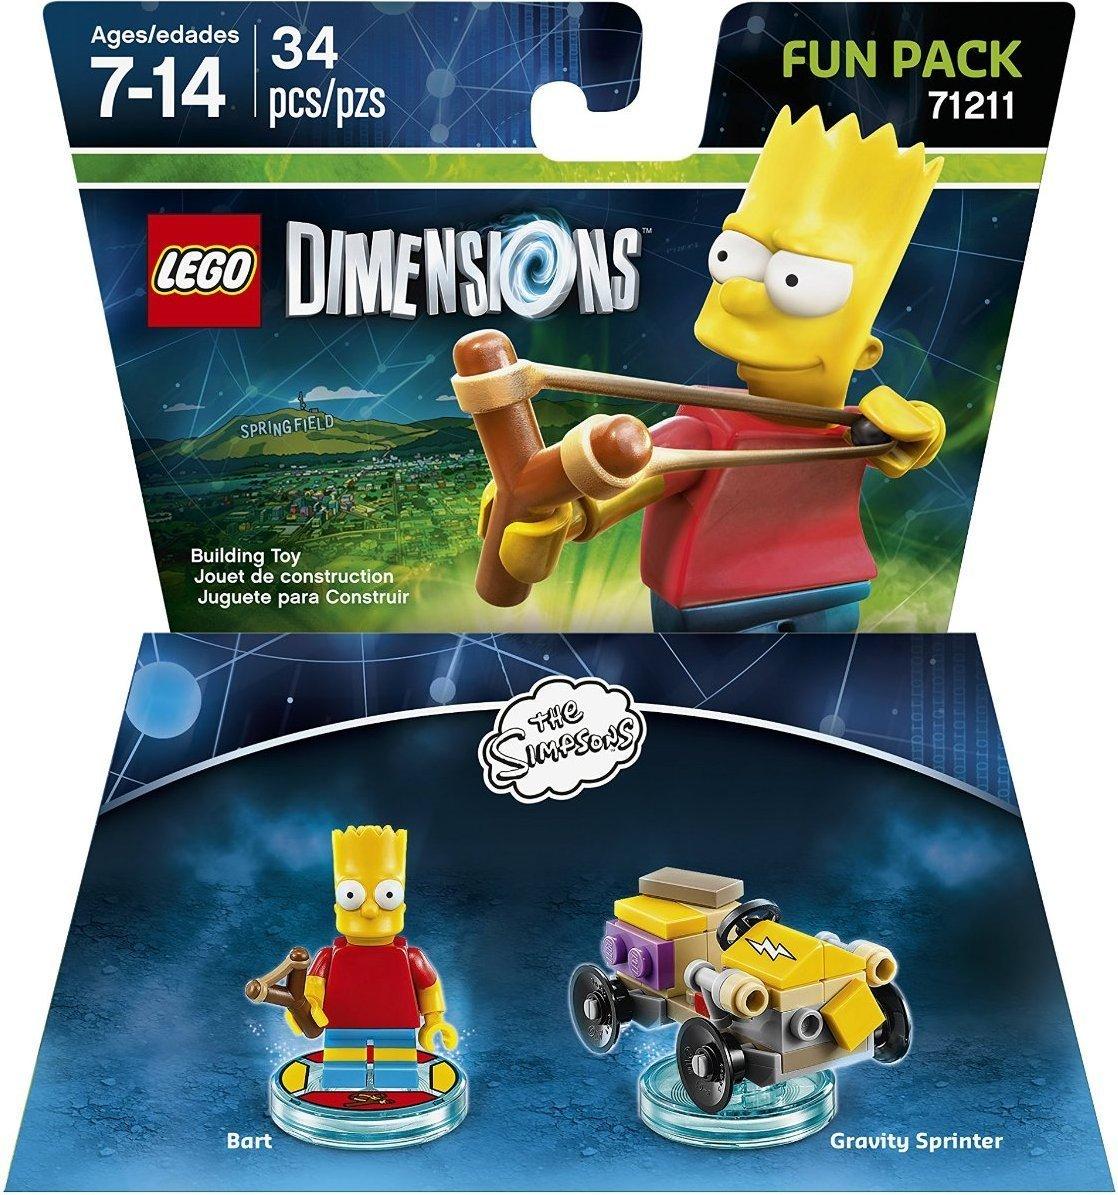 Amazon: Simpsons Bart Fun Pack - LEGO Dimensions. Tambien bajo Homero a $49